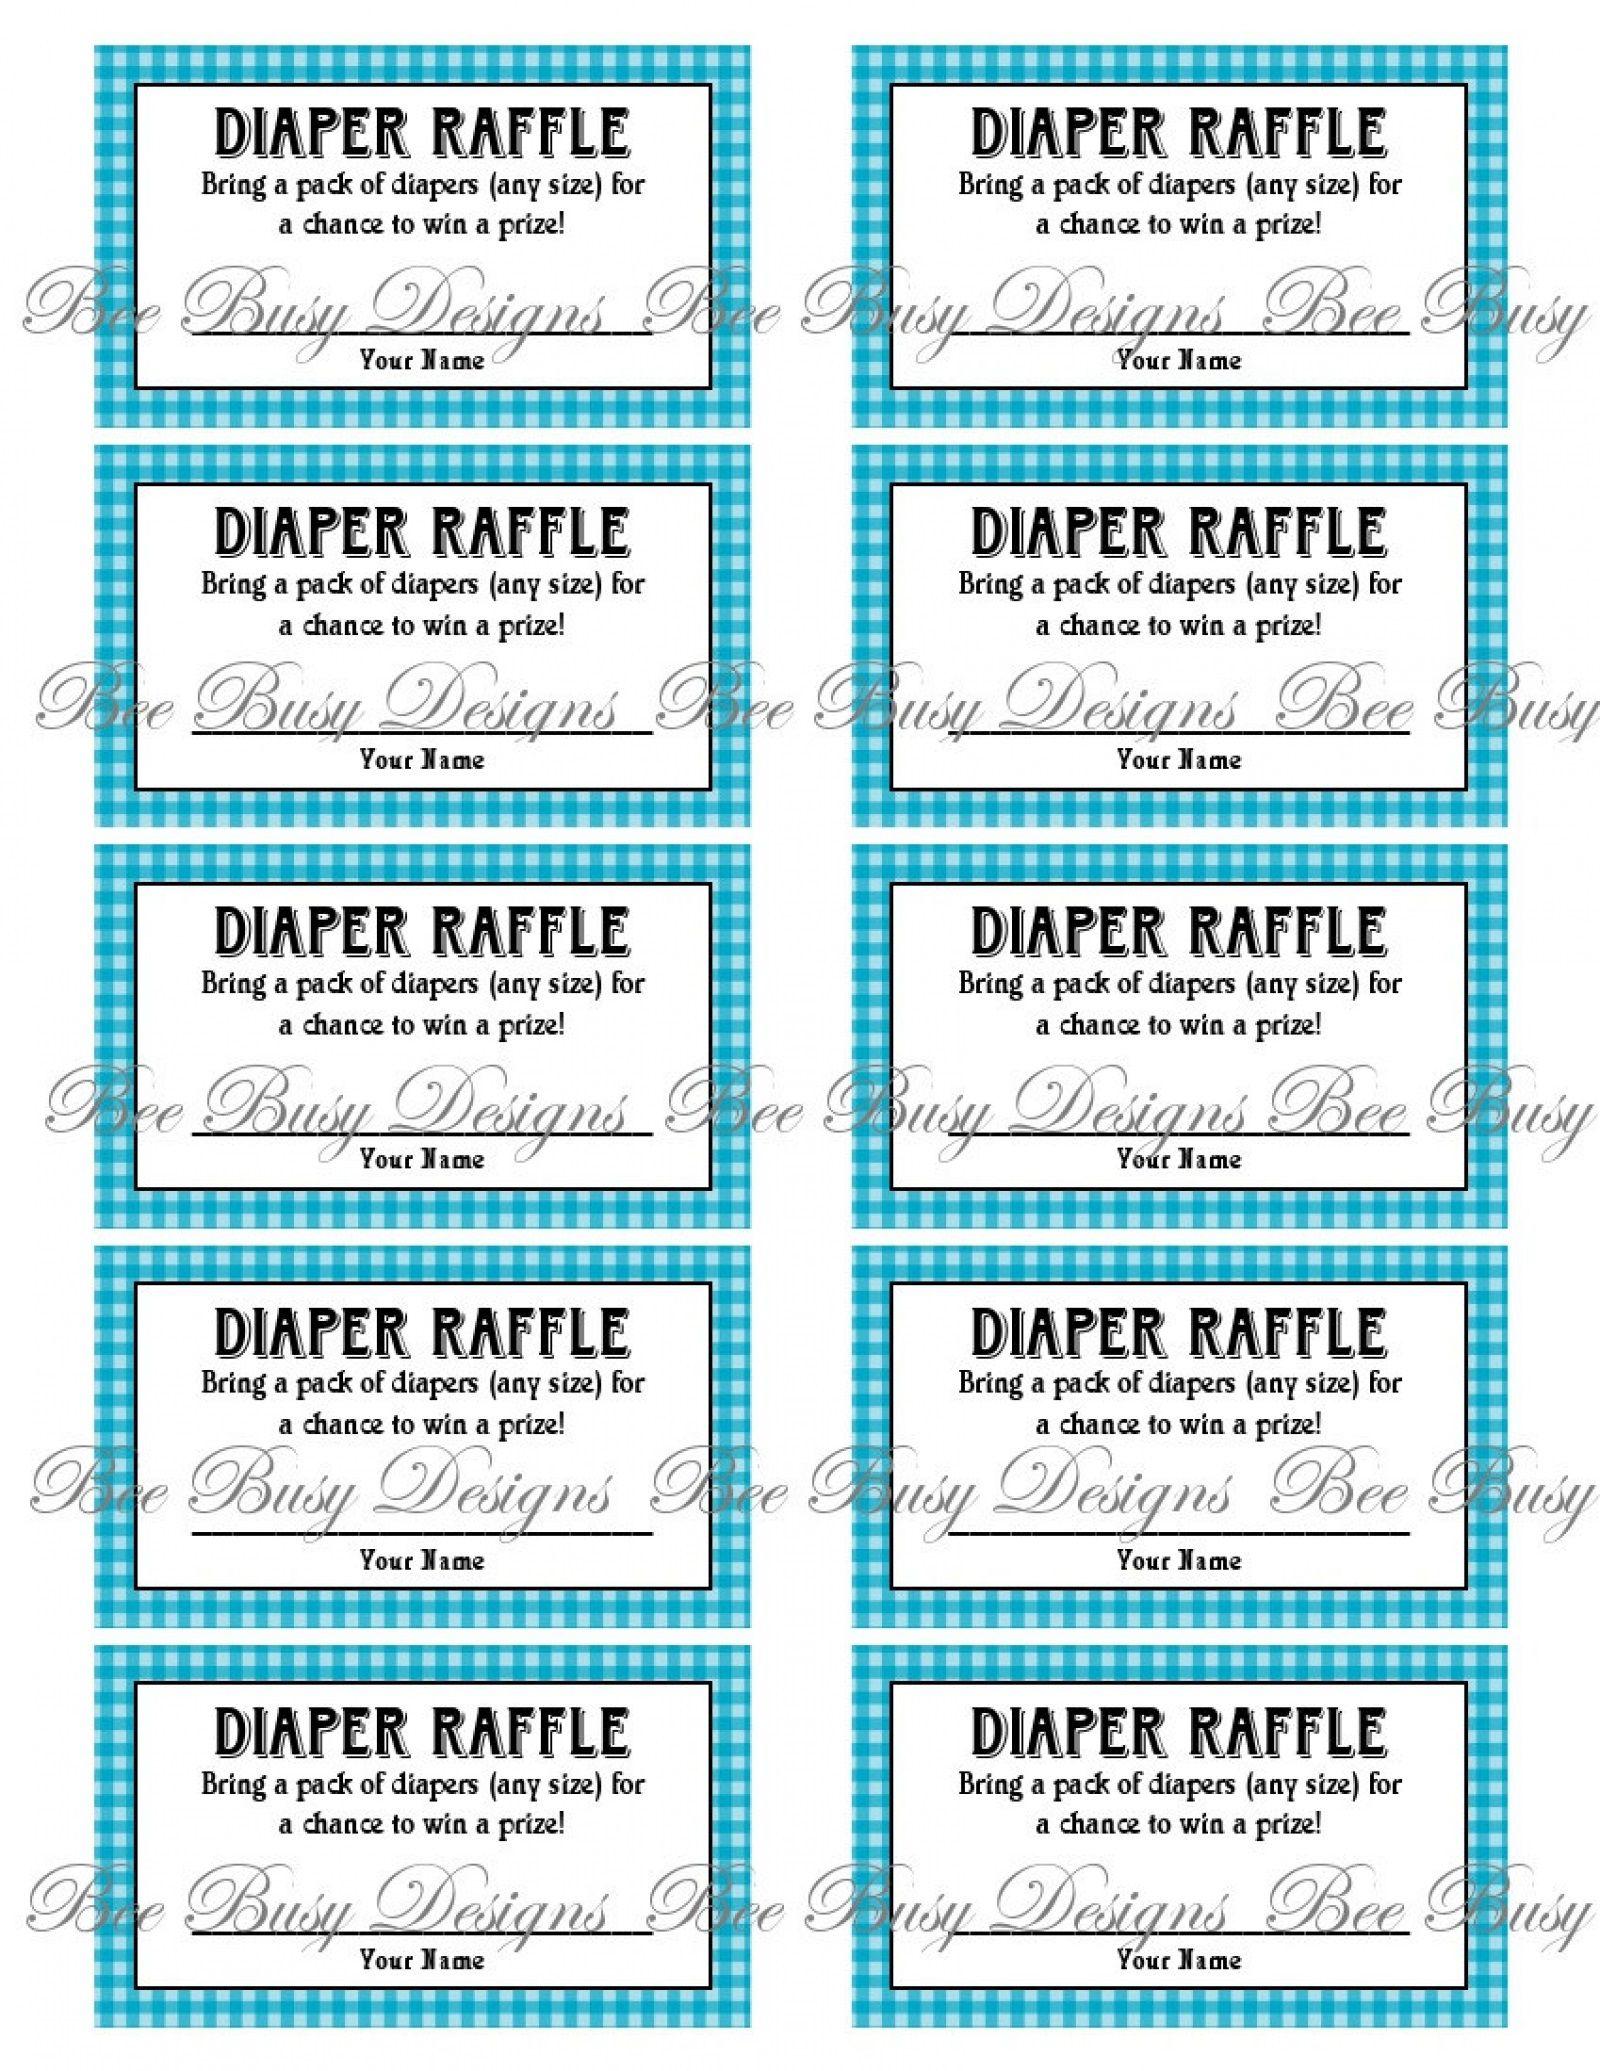 009 Astounding Diaper Raffle Ticket Template High Resolution  Boy Free Printable Print Black And WhiteFull